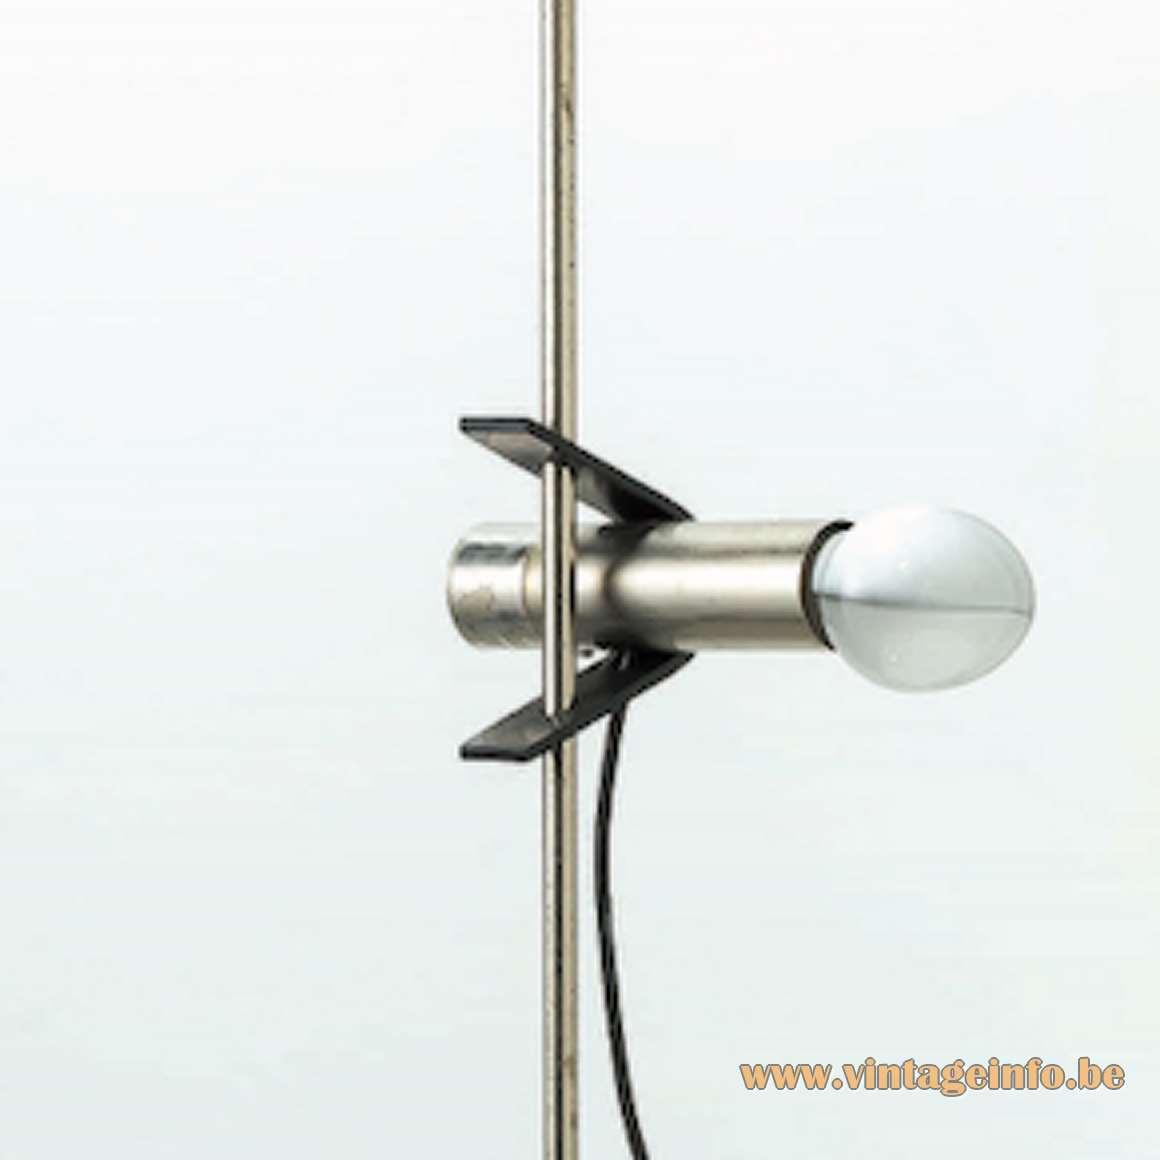 Renato Forti & Angelo Ostuni Oluce Floor Lamp 399 round base & rod 1 clamp light 1960s Italy MCM